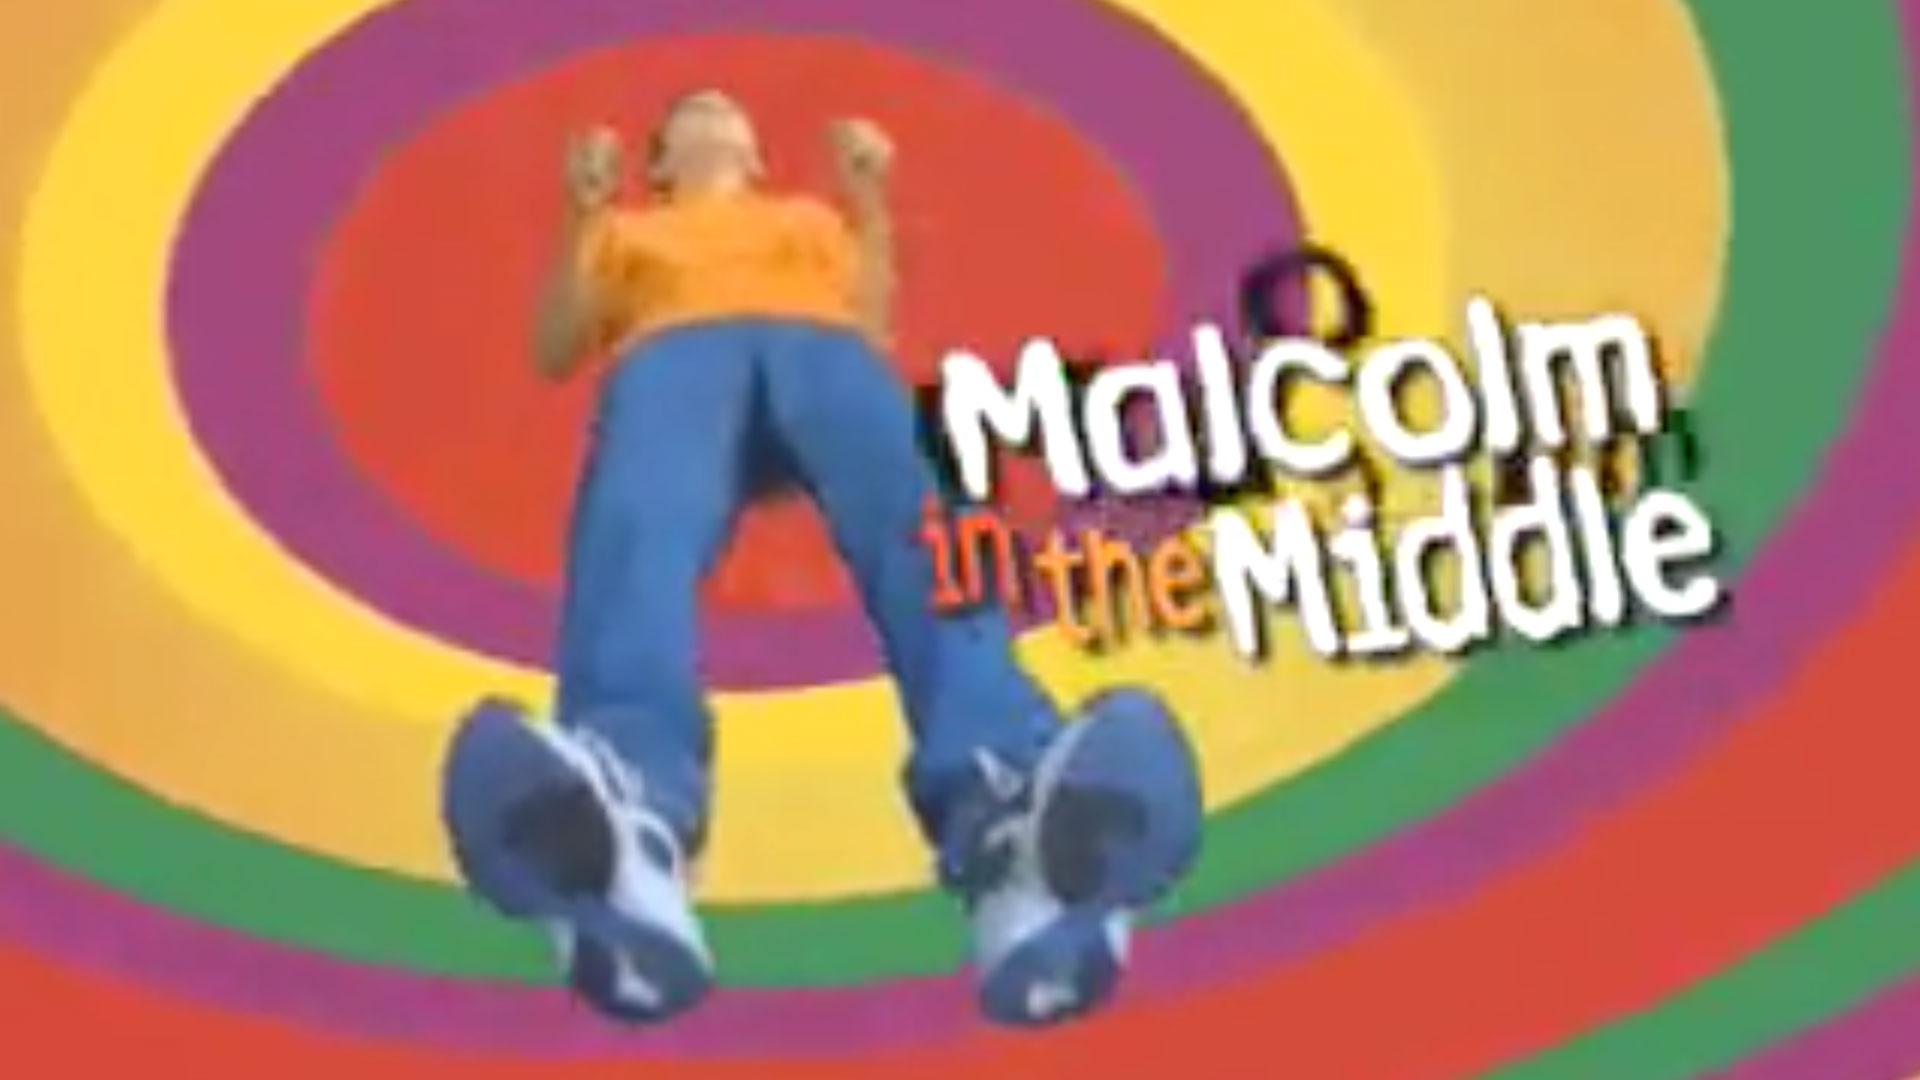 Promo <em>Malcolm</em> en syndication (États-Unis)